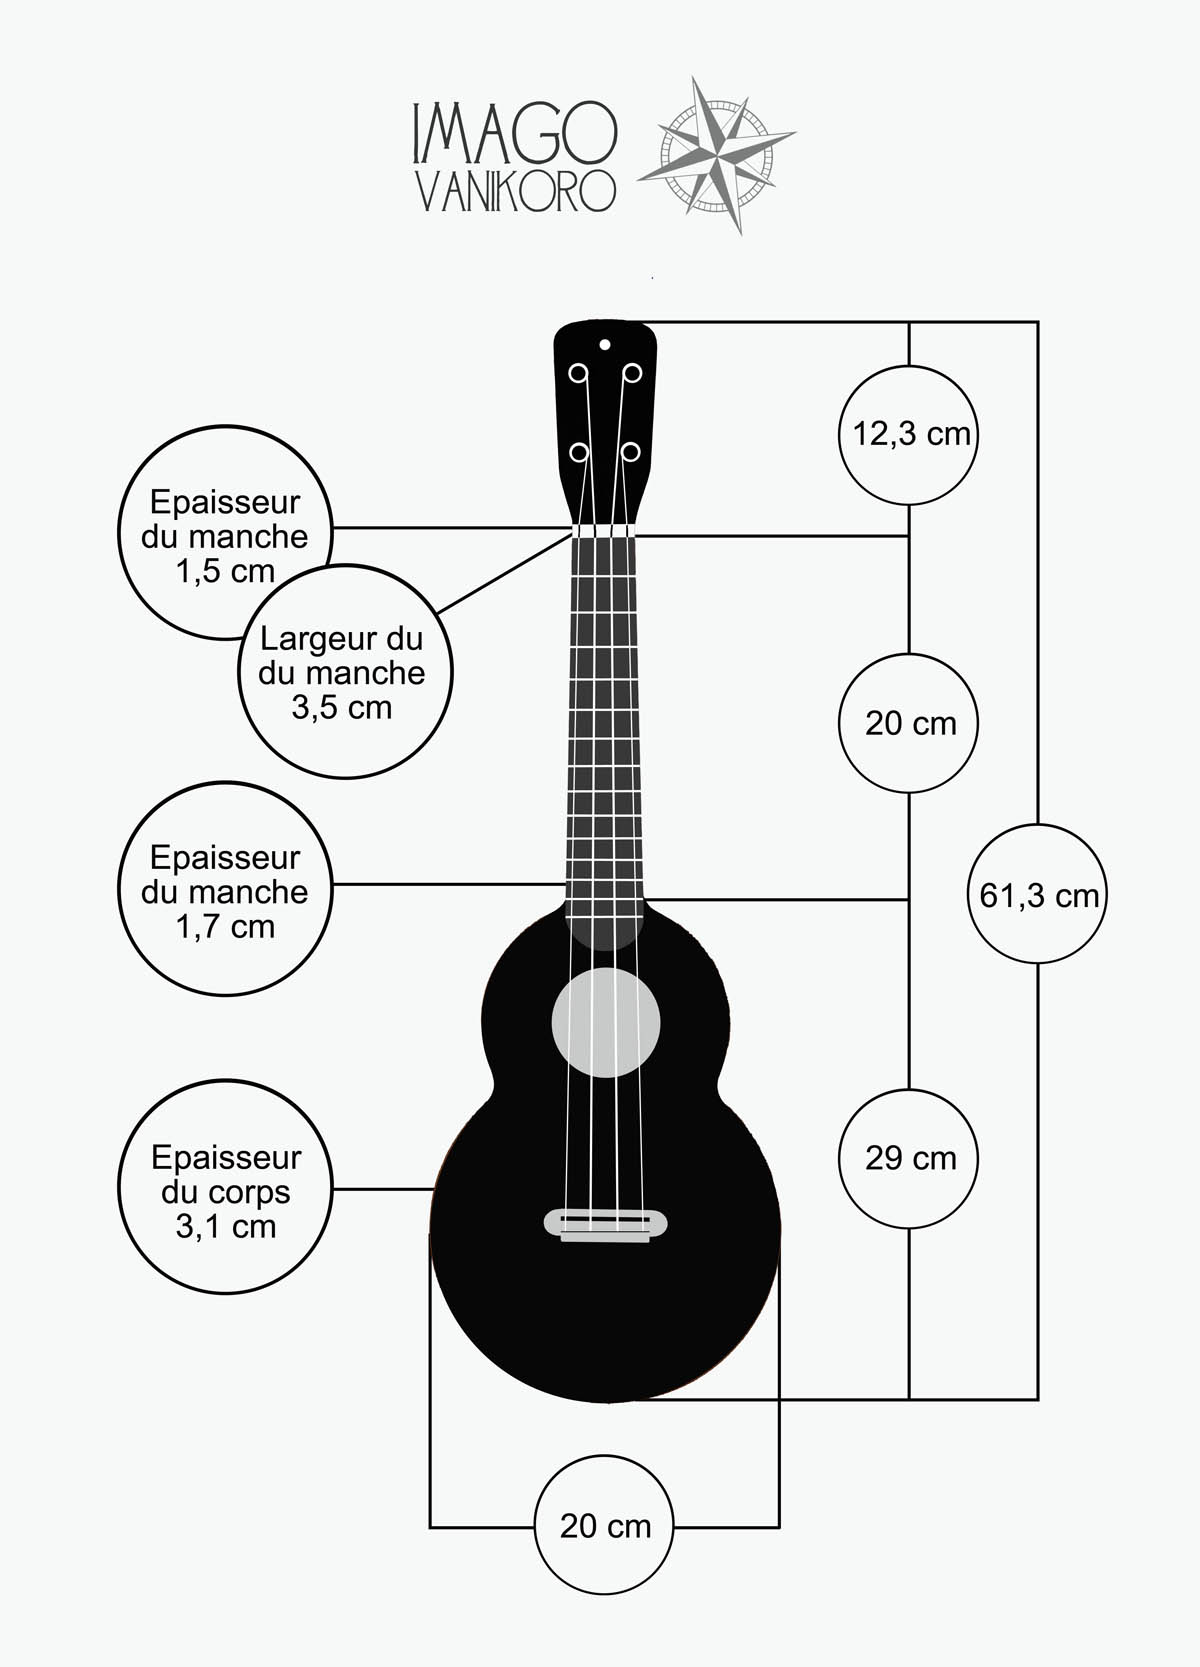 vanikoro dimensions